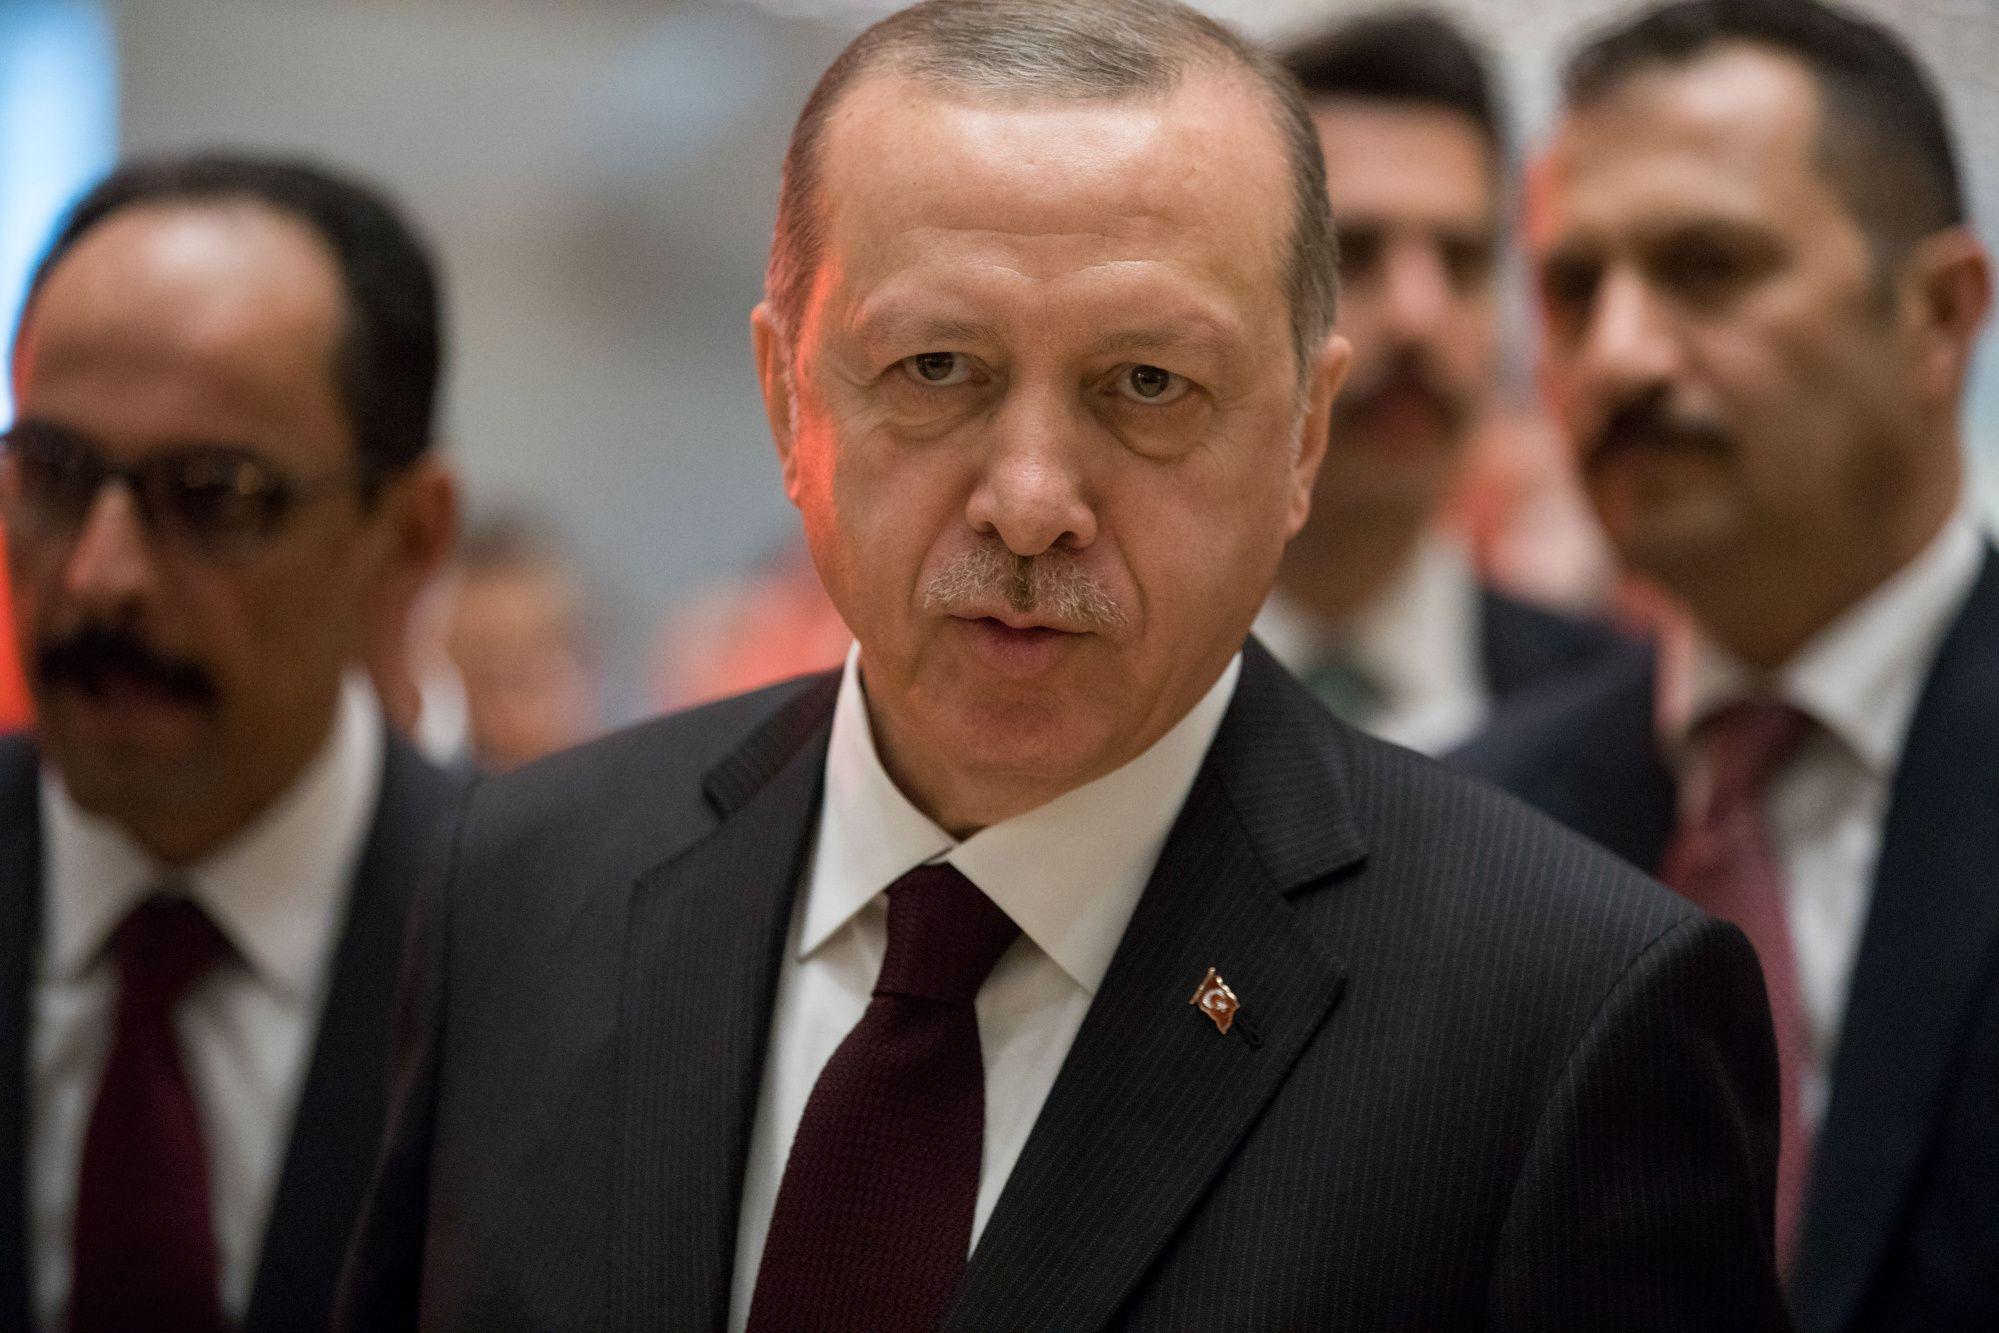 Turkey's Erdogan Joins In on Vilification of Soros